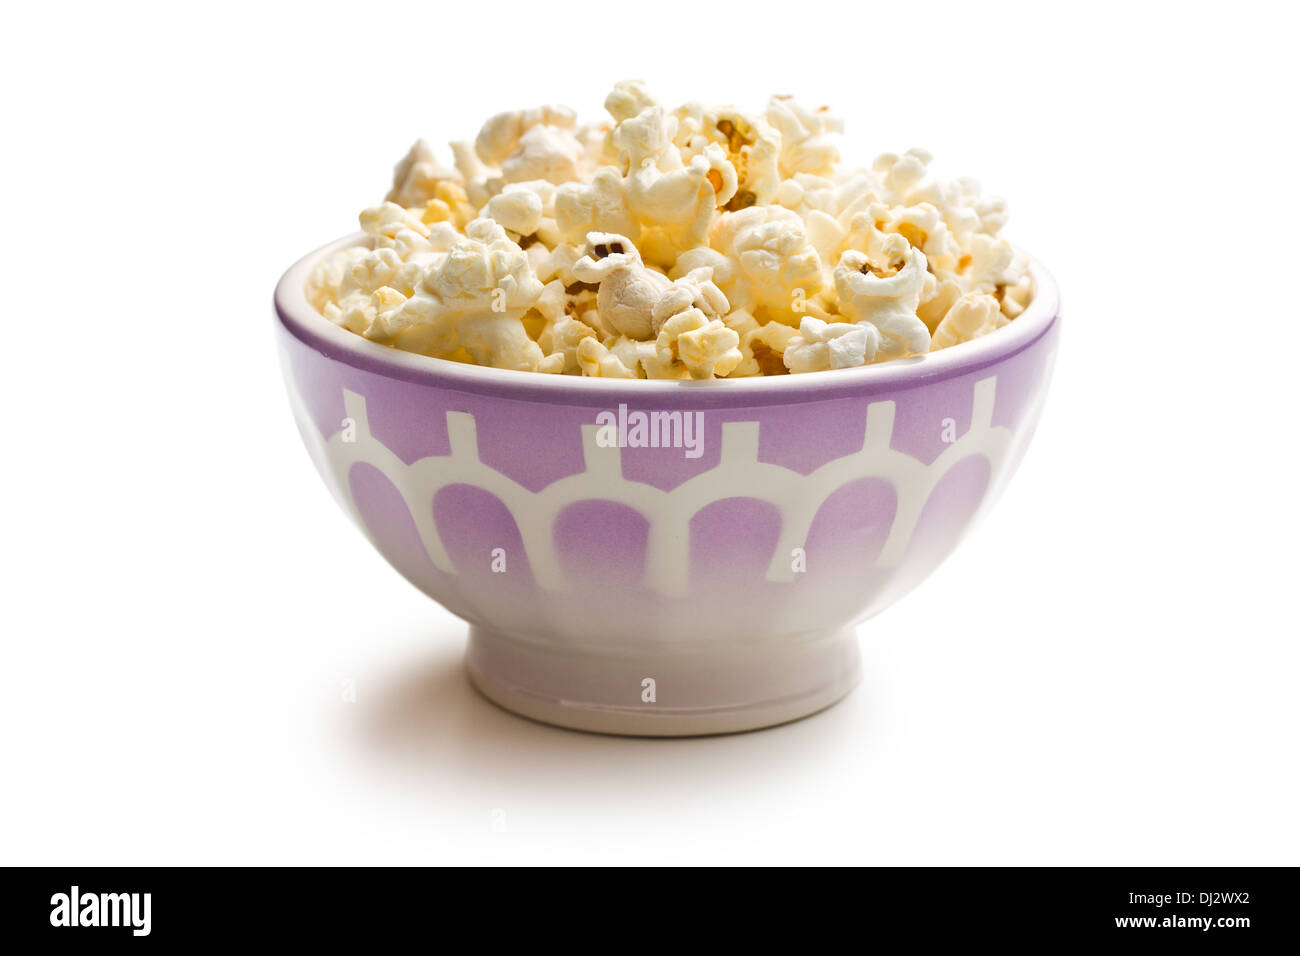 popcorn in ceramic bowl on white background - Stock Image